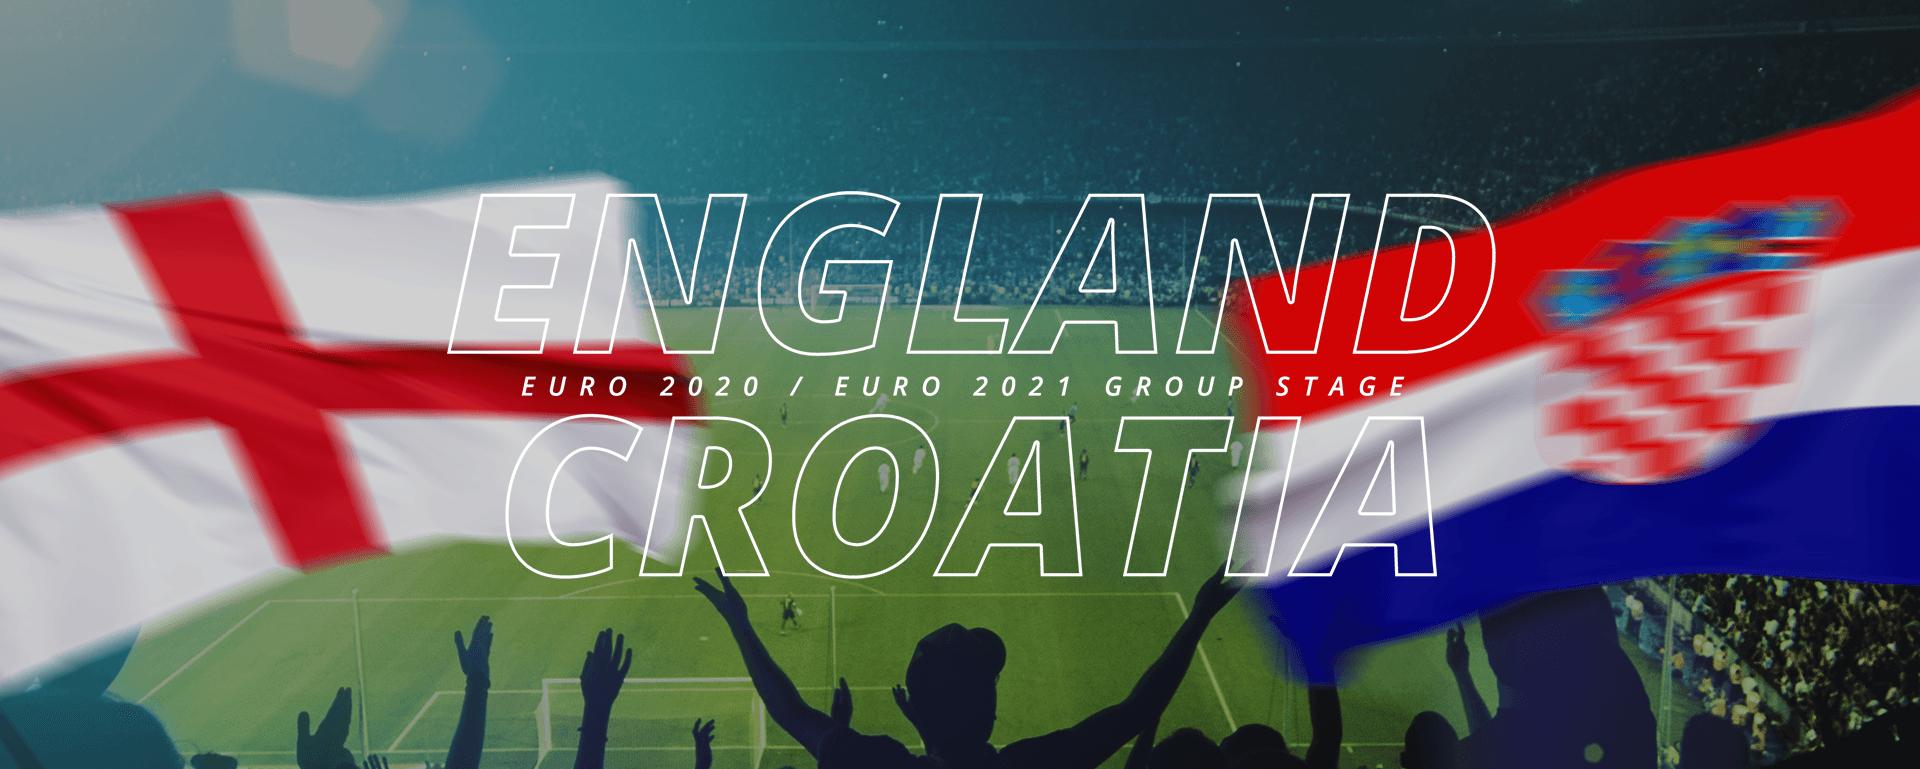 ENGLAND VS CROATIA: BETTING PREVIEW